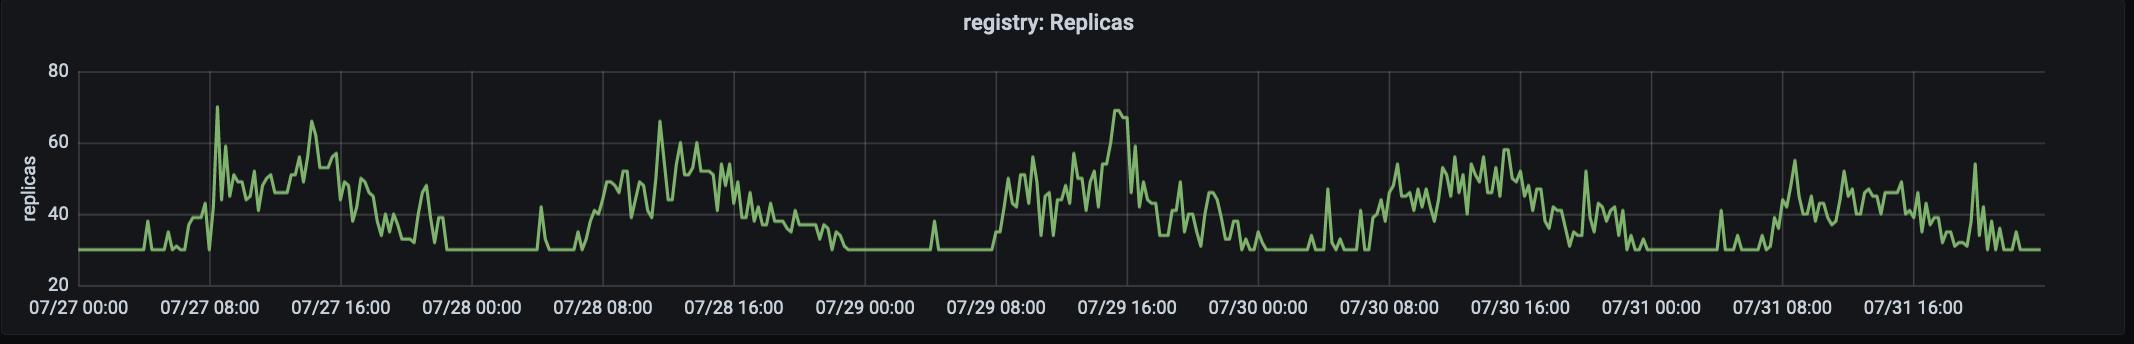 Наши выводы за год миграции GitLab.com на Kubernetes - 4